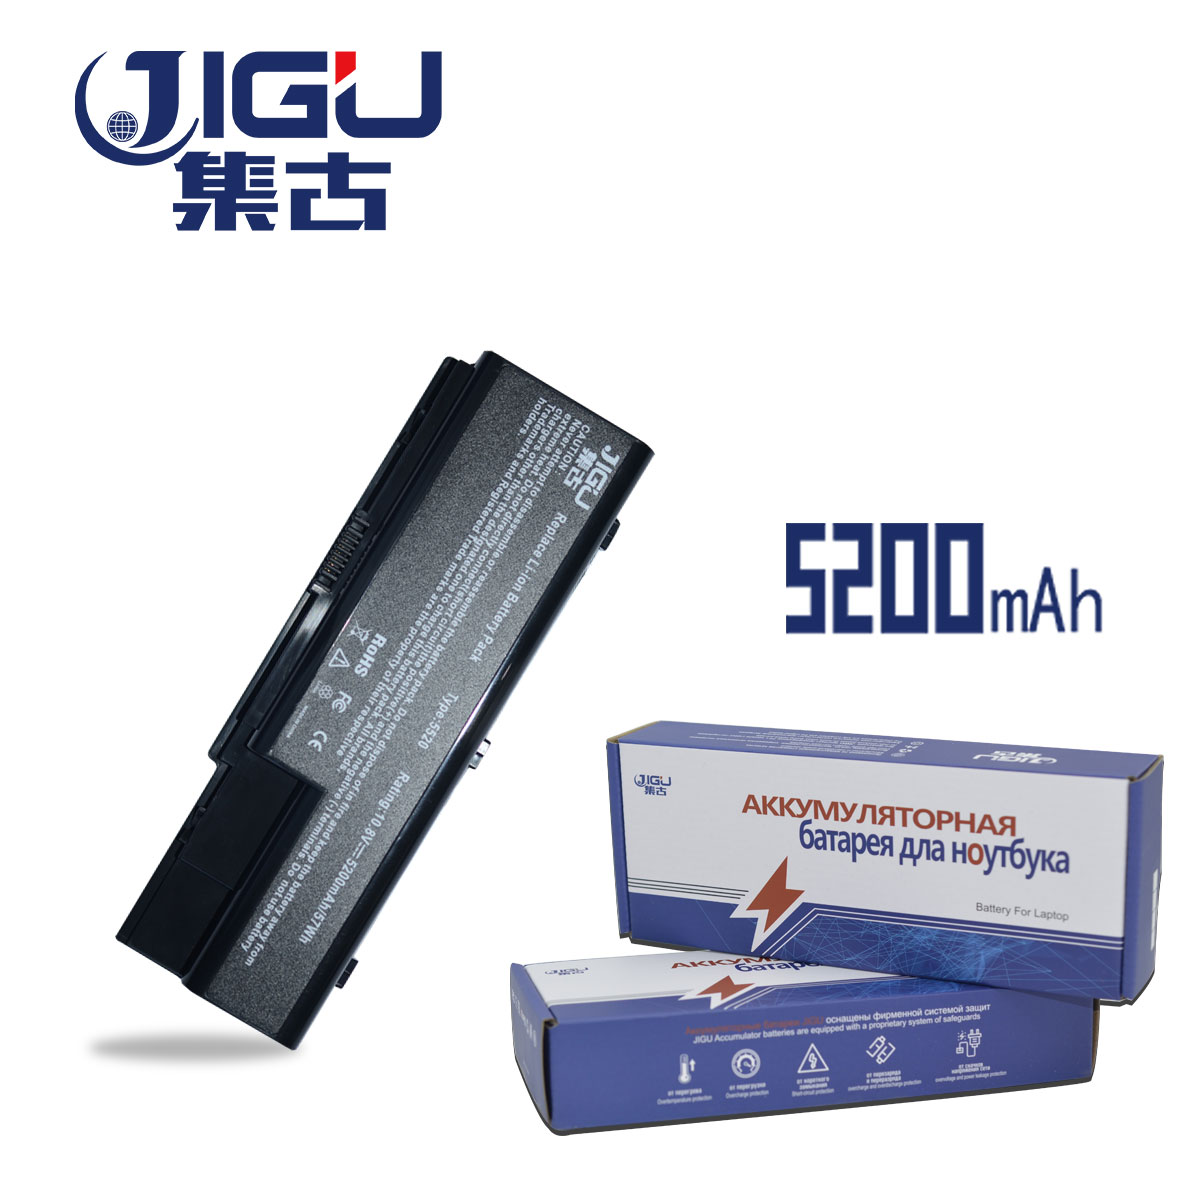 JIGU For Acer Aspire Battery 5520 5720 5920 6920 6920G 7520 7720 7720G 7720Z Series AS07B31 AS07B41 AS07B42 AS07B72 CONIS72 for acer 7220 7520 5315 5720 7720 5520 5310 laptop cpu fan